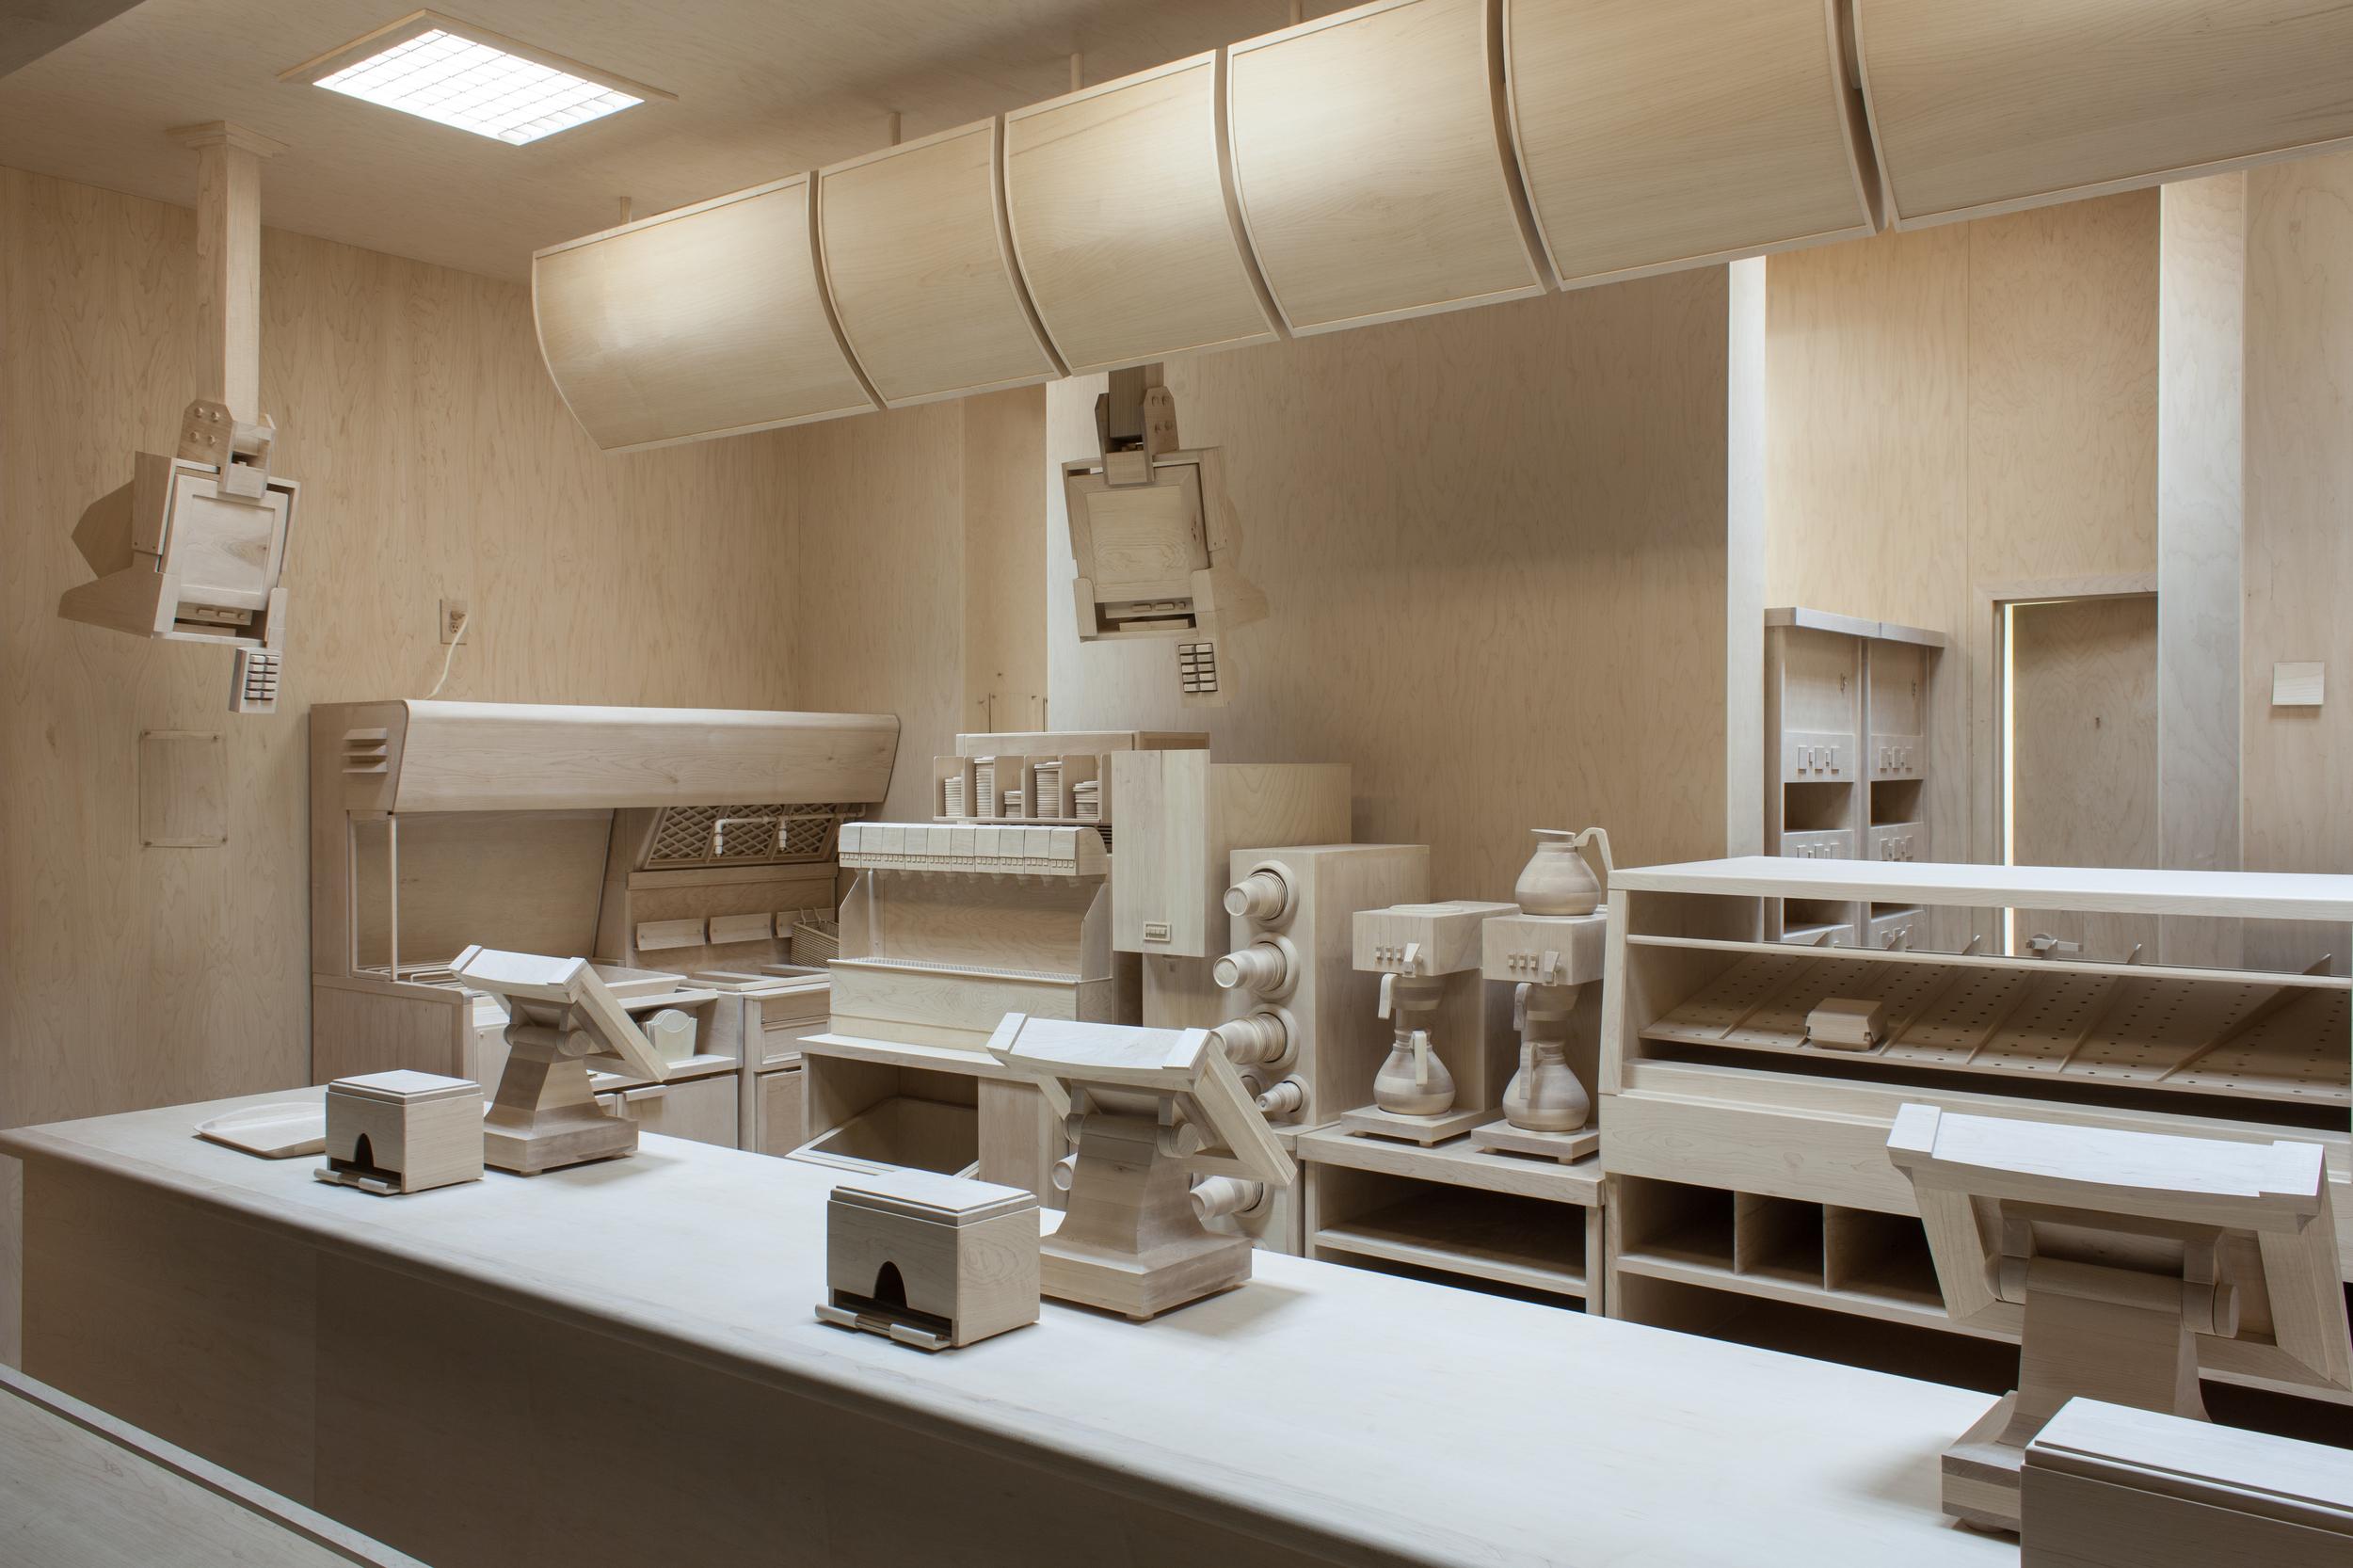 Apparatus-Interiors-01-300.jpg